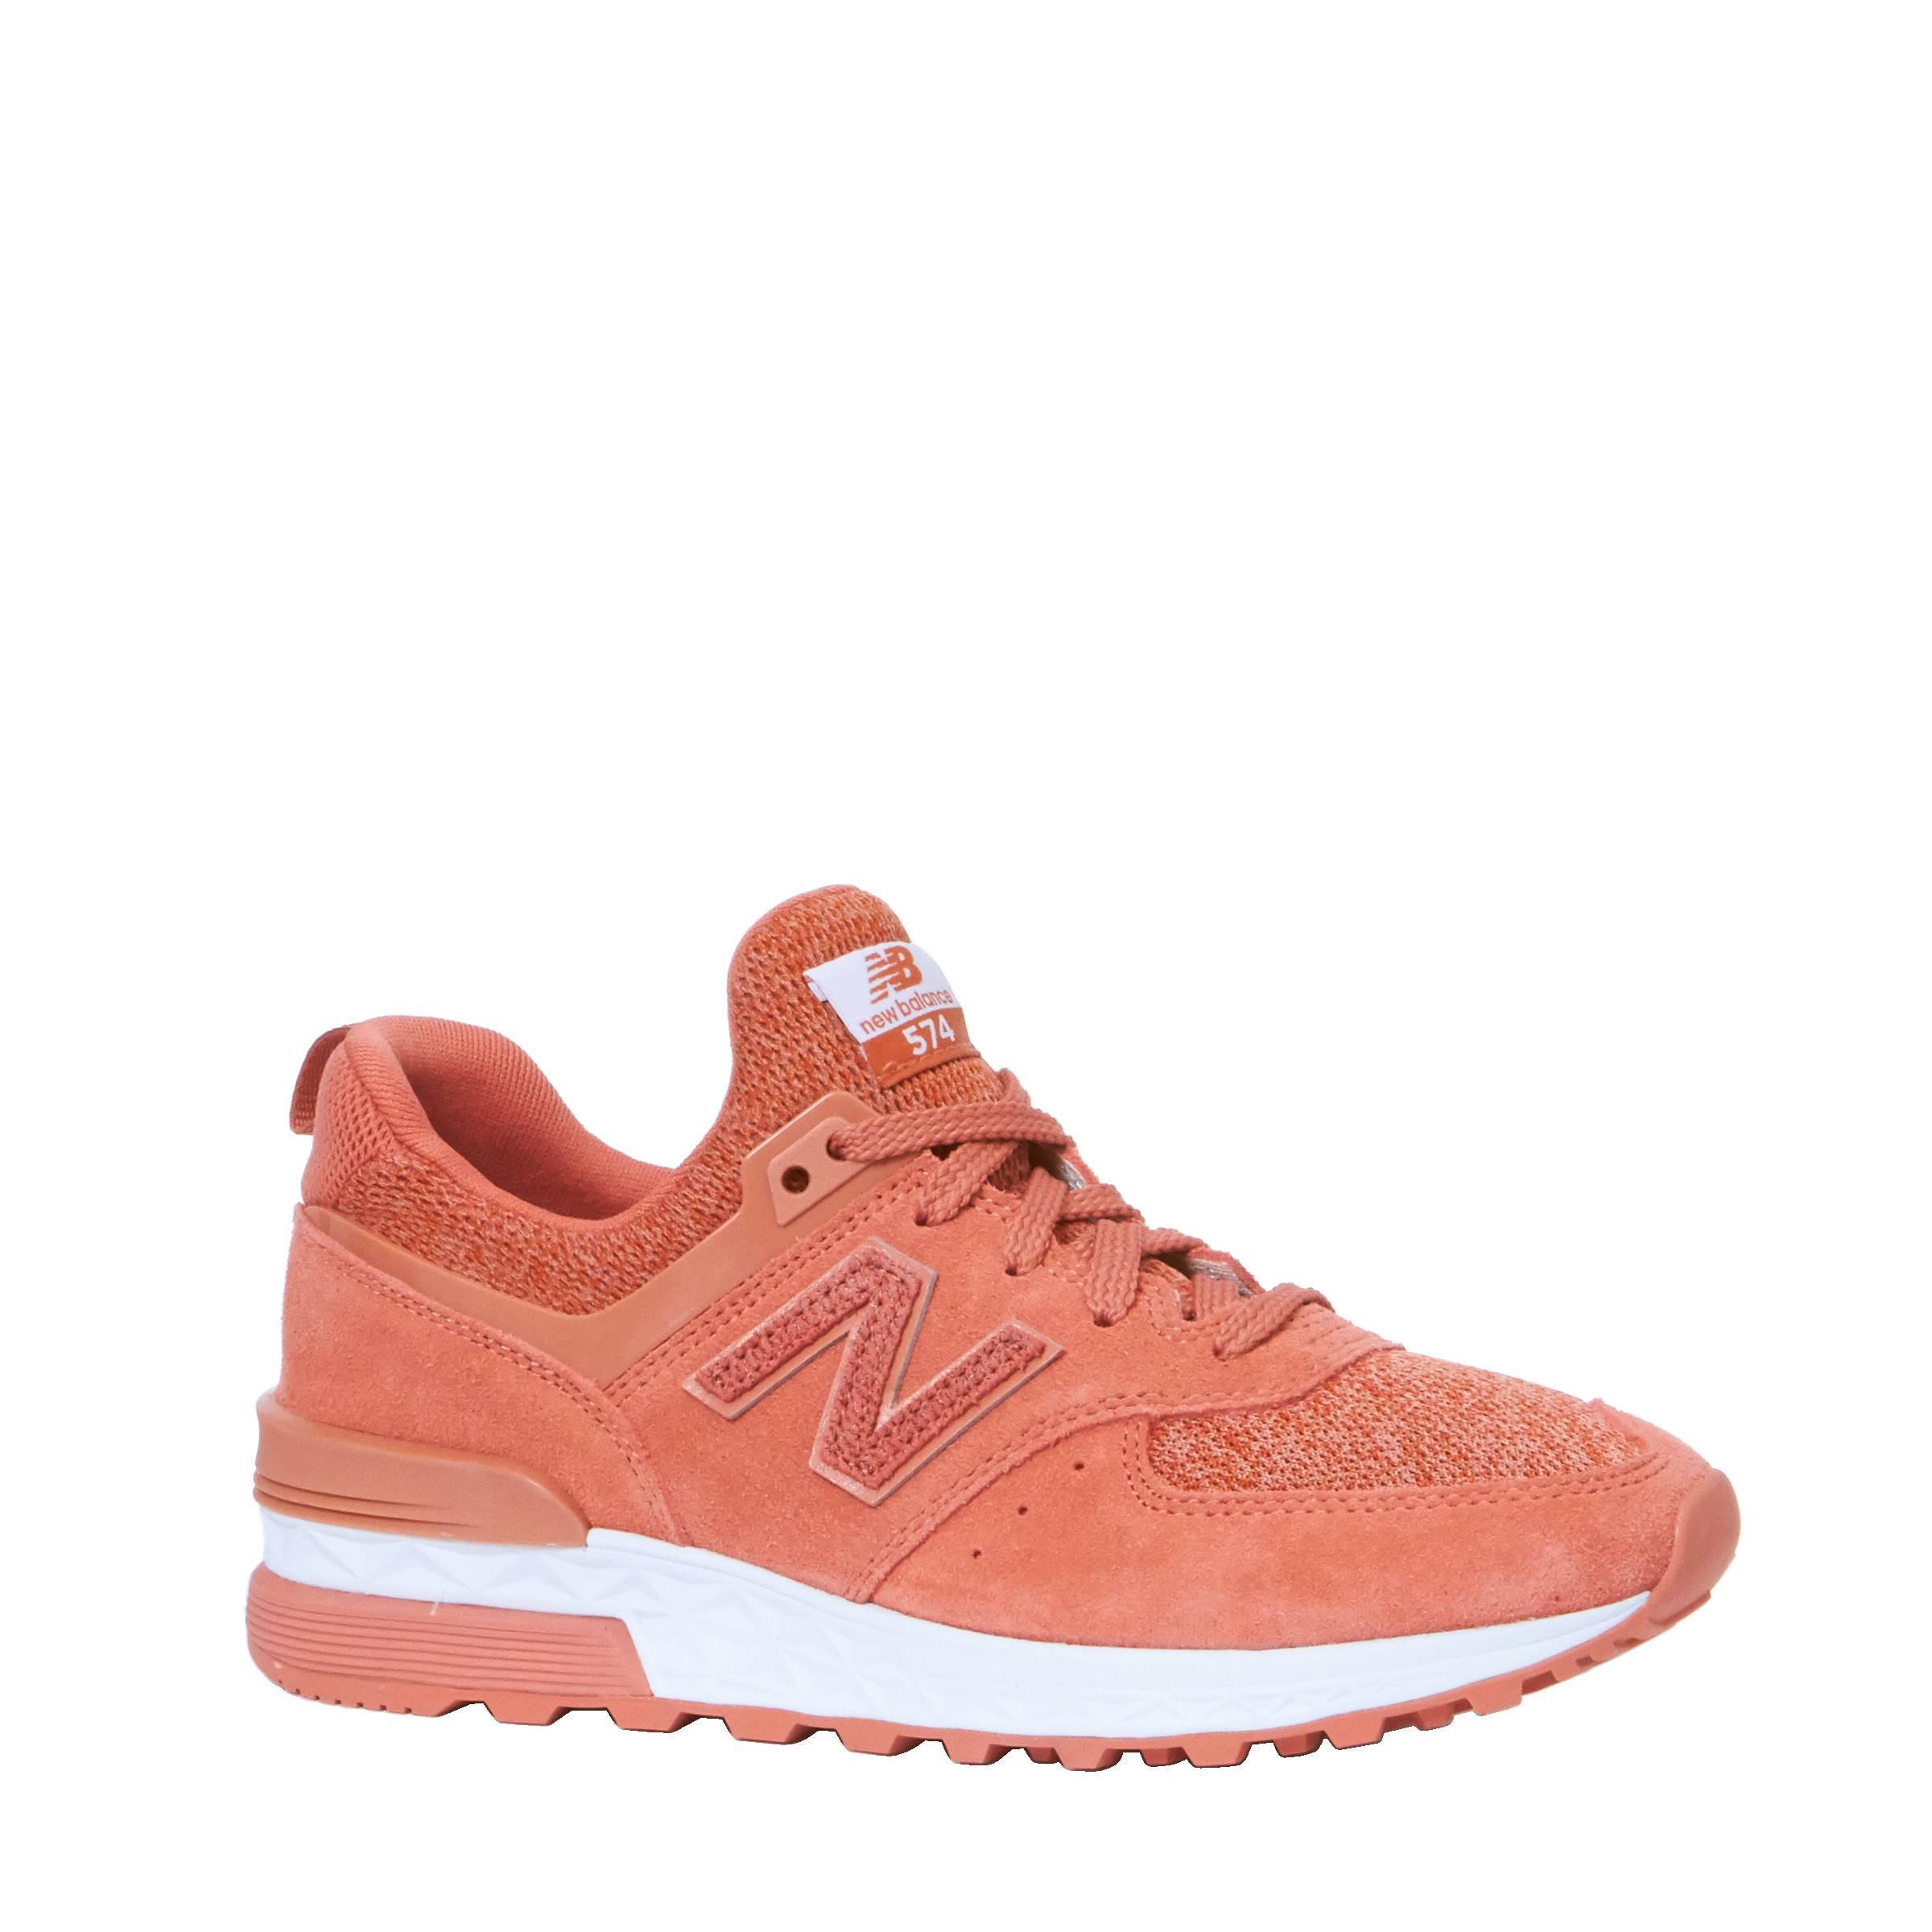 Wehkamp 574 Balance New Sneakers Sneakers New 574 Wehkamp Balance New T4x54f0w